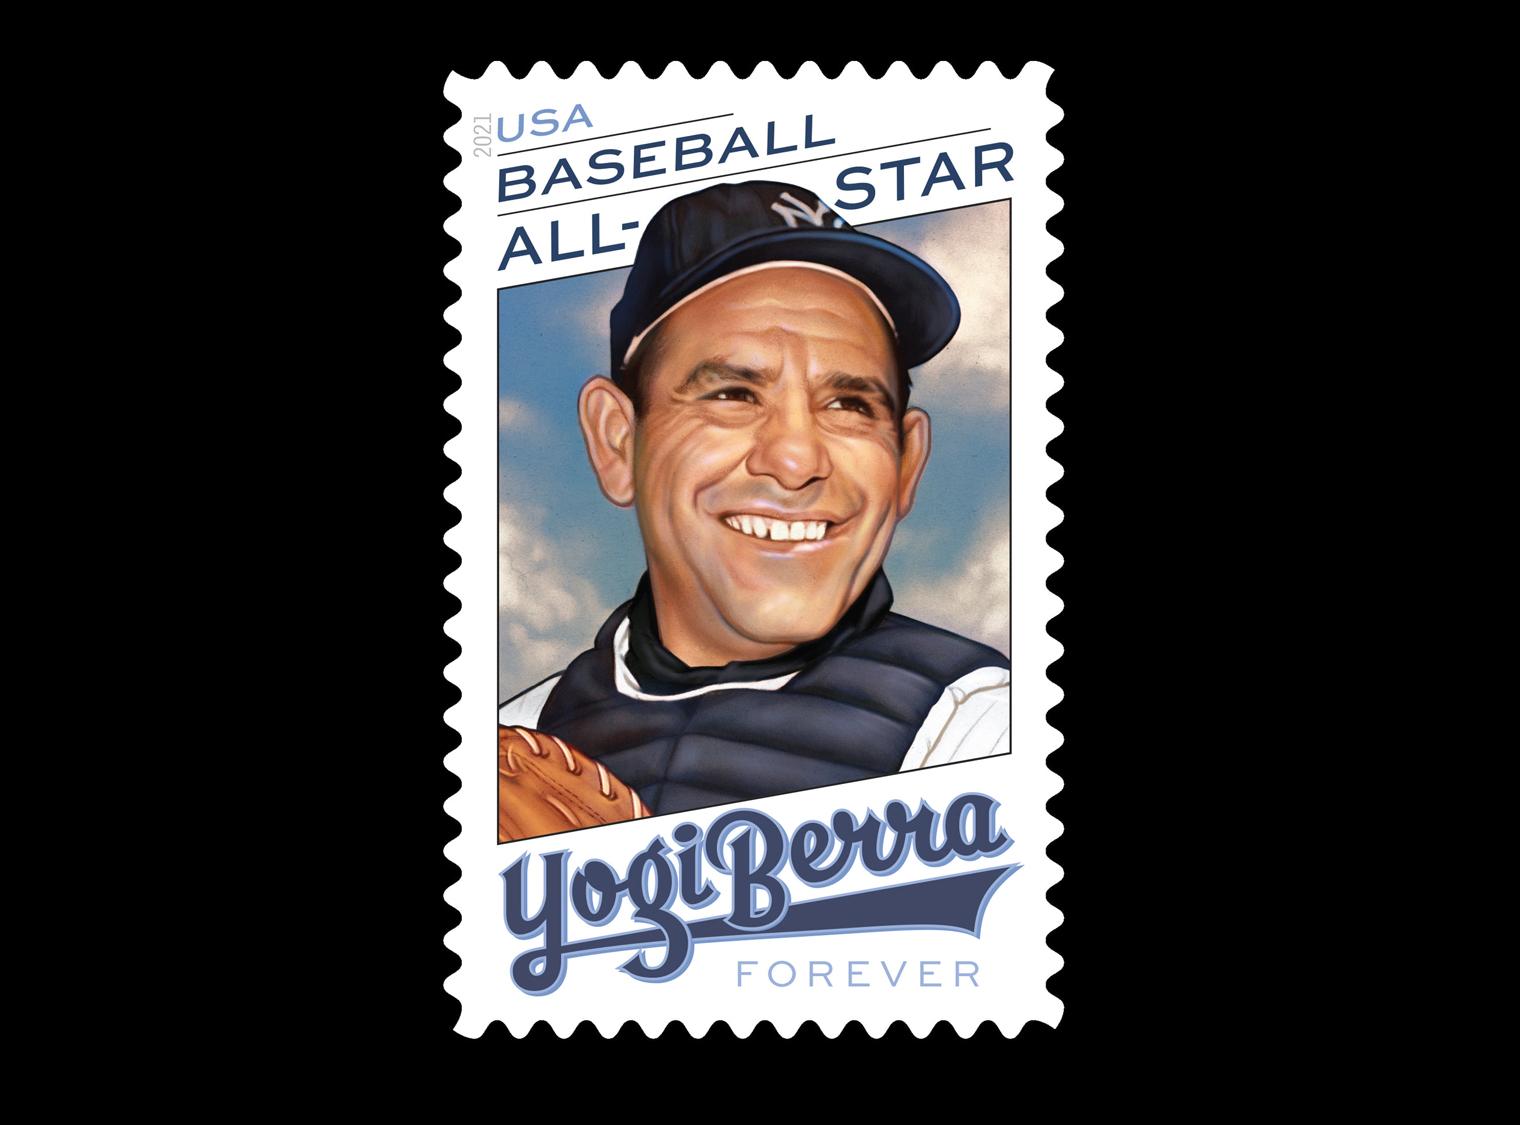 Stamp featuring an illustration of Yogi Berra, Baseball All=Star